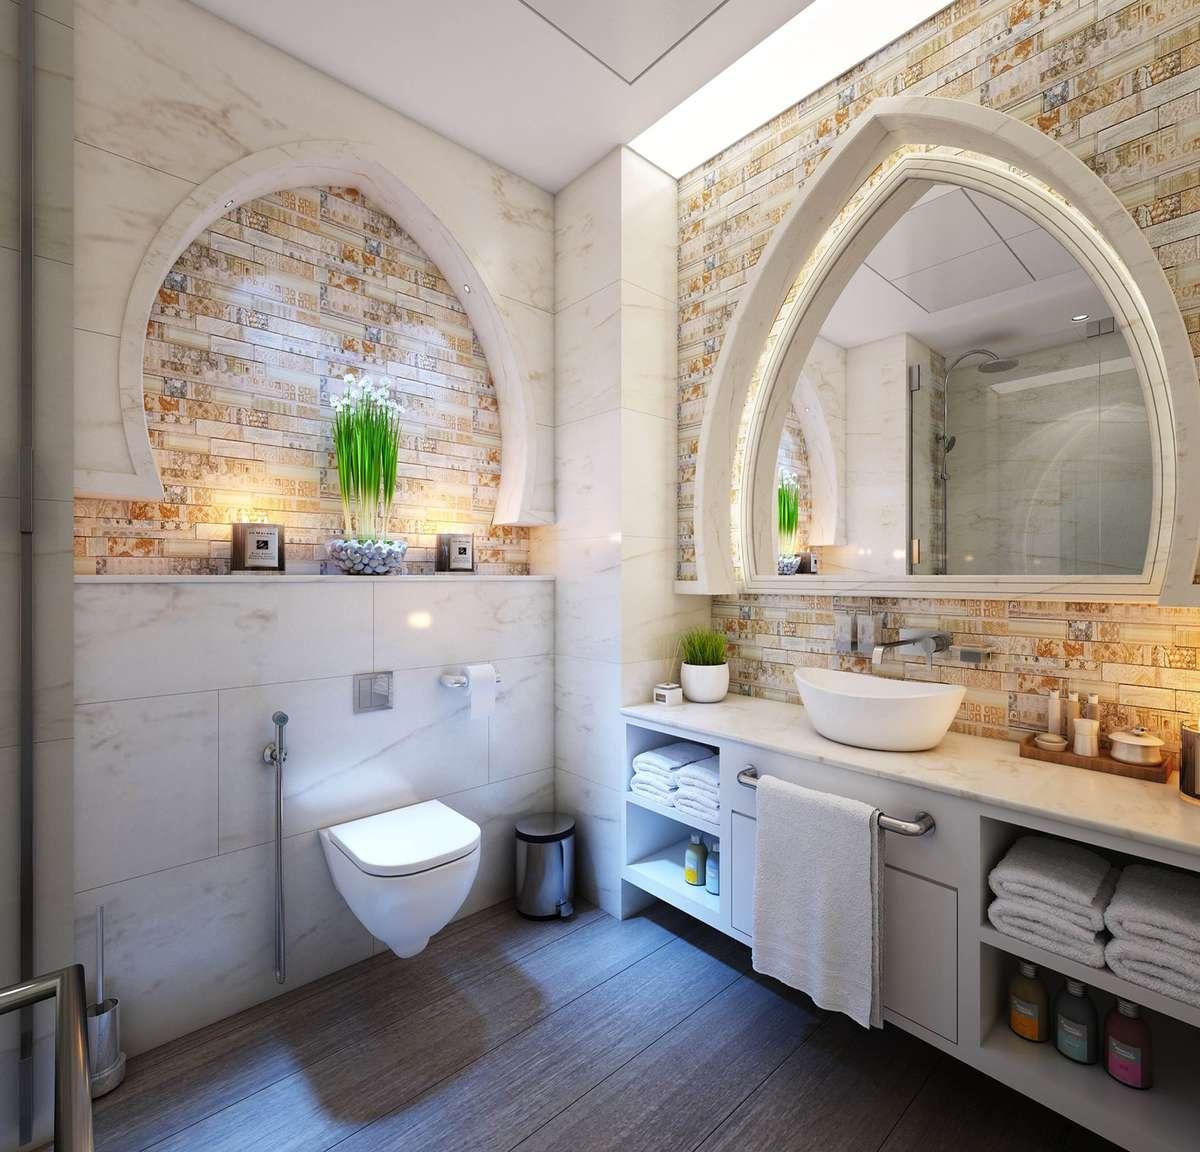 A beautiful shower room